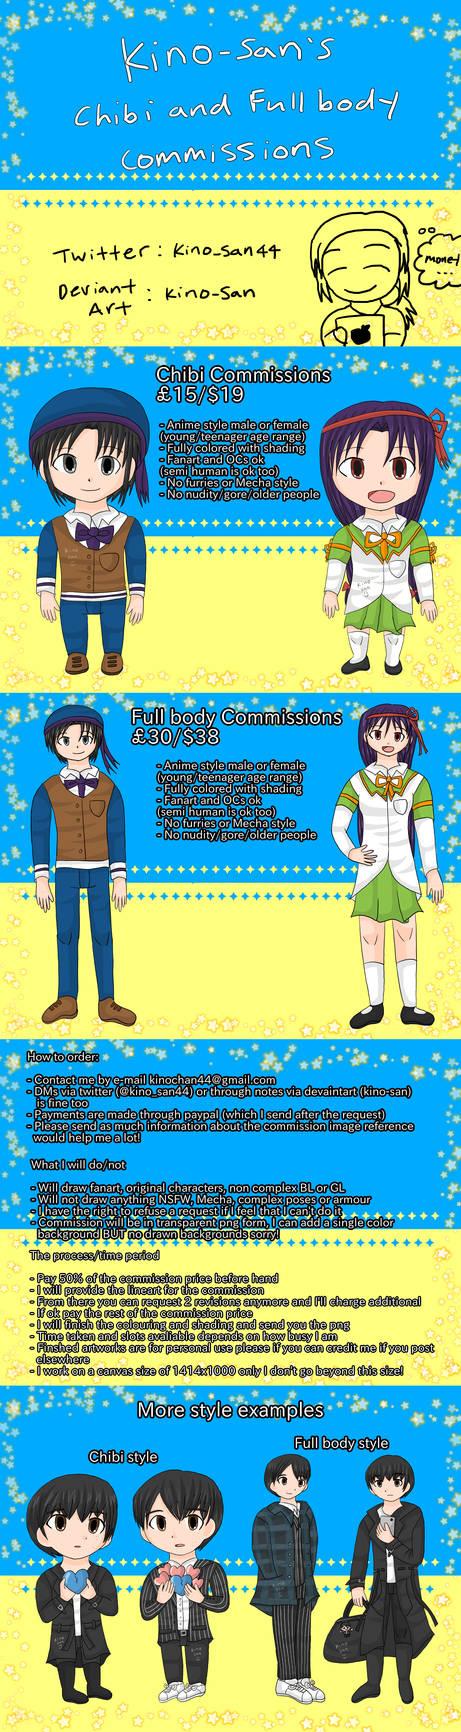 Kino-san's commission sheet 2020